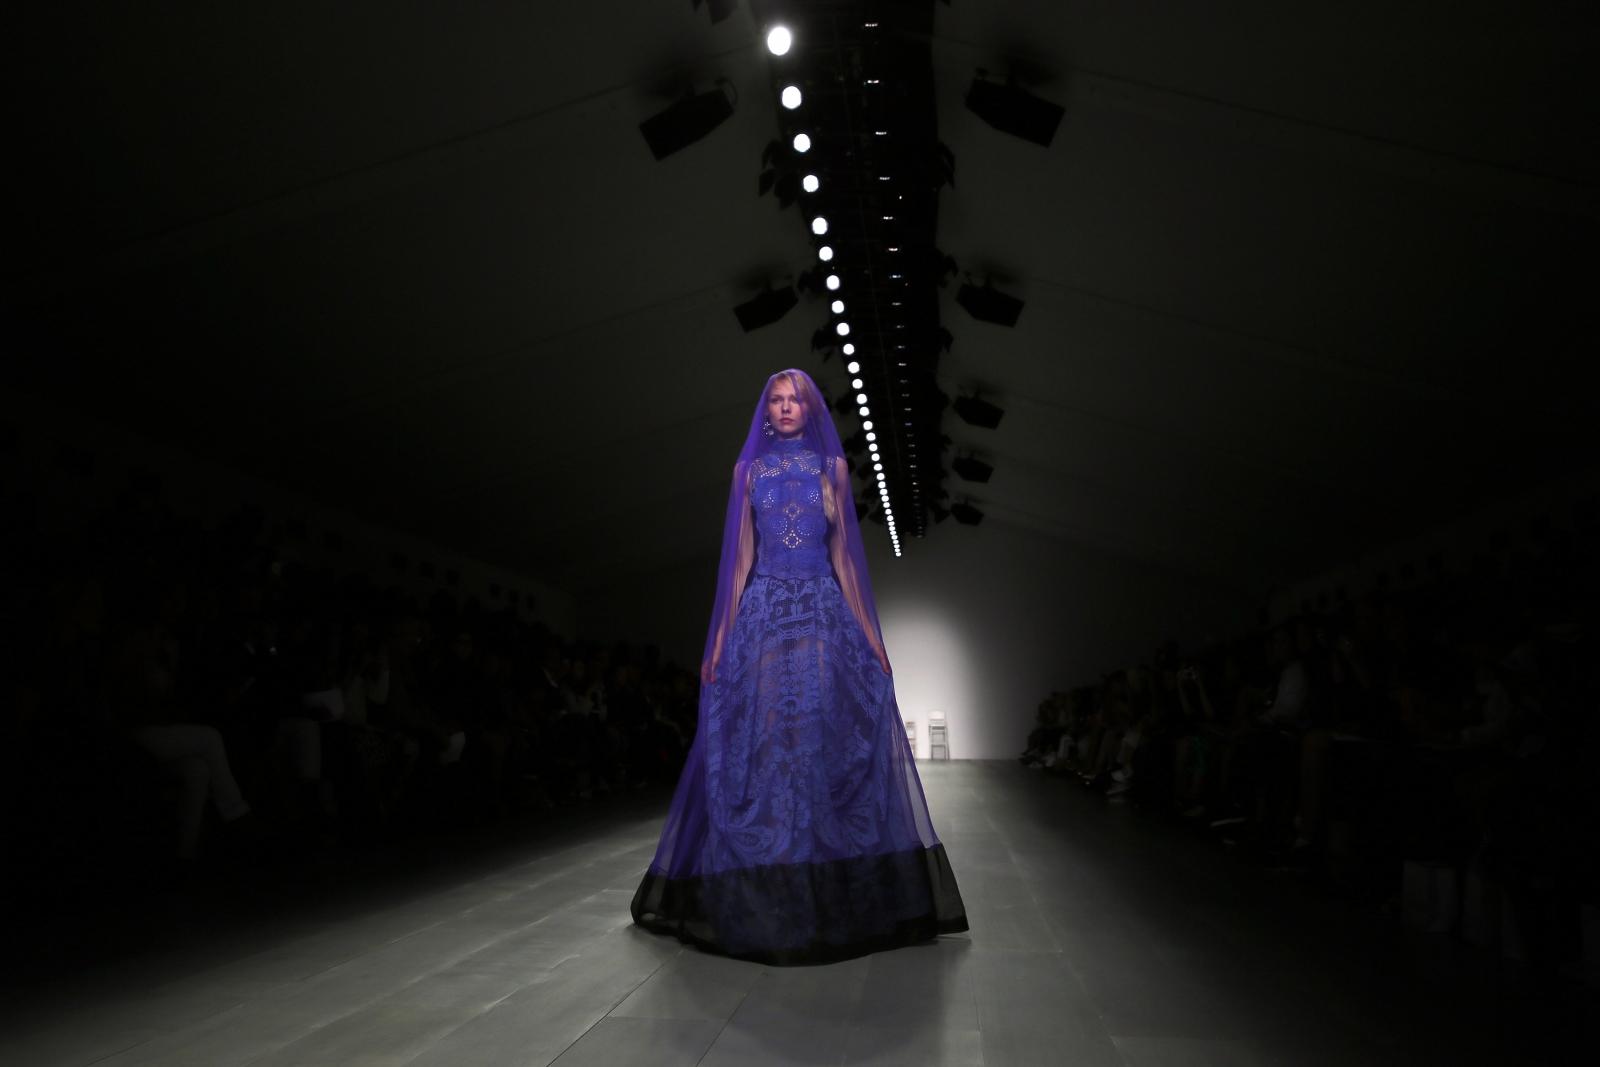 London Fashion Week - Day 1 - 02